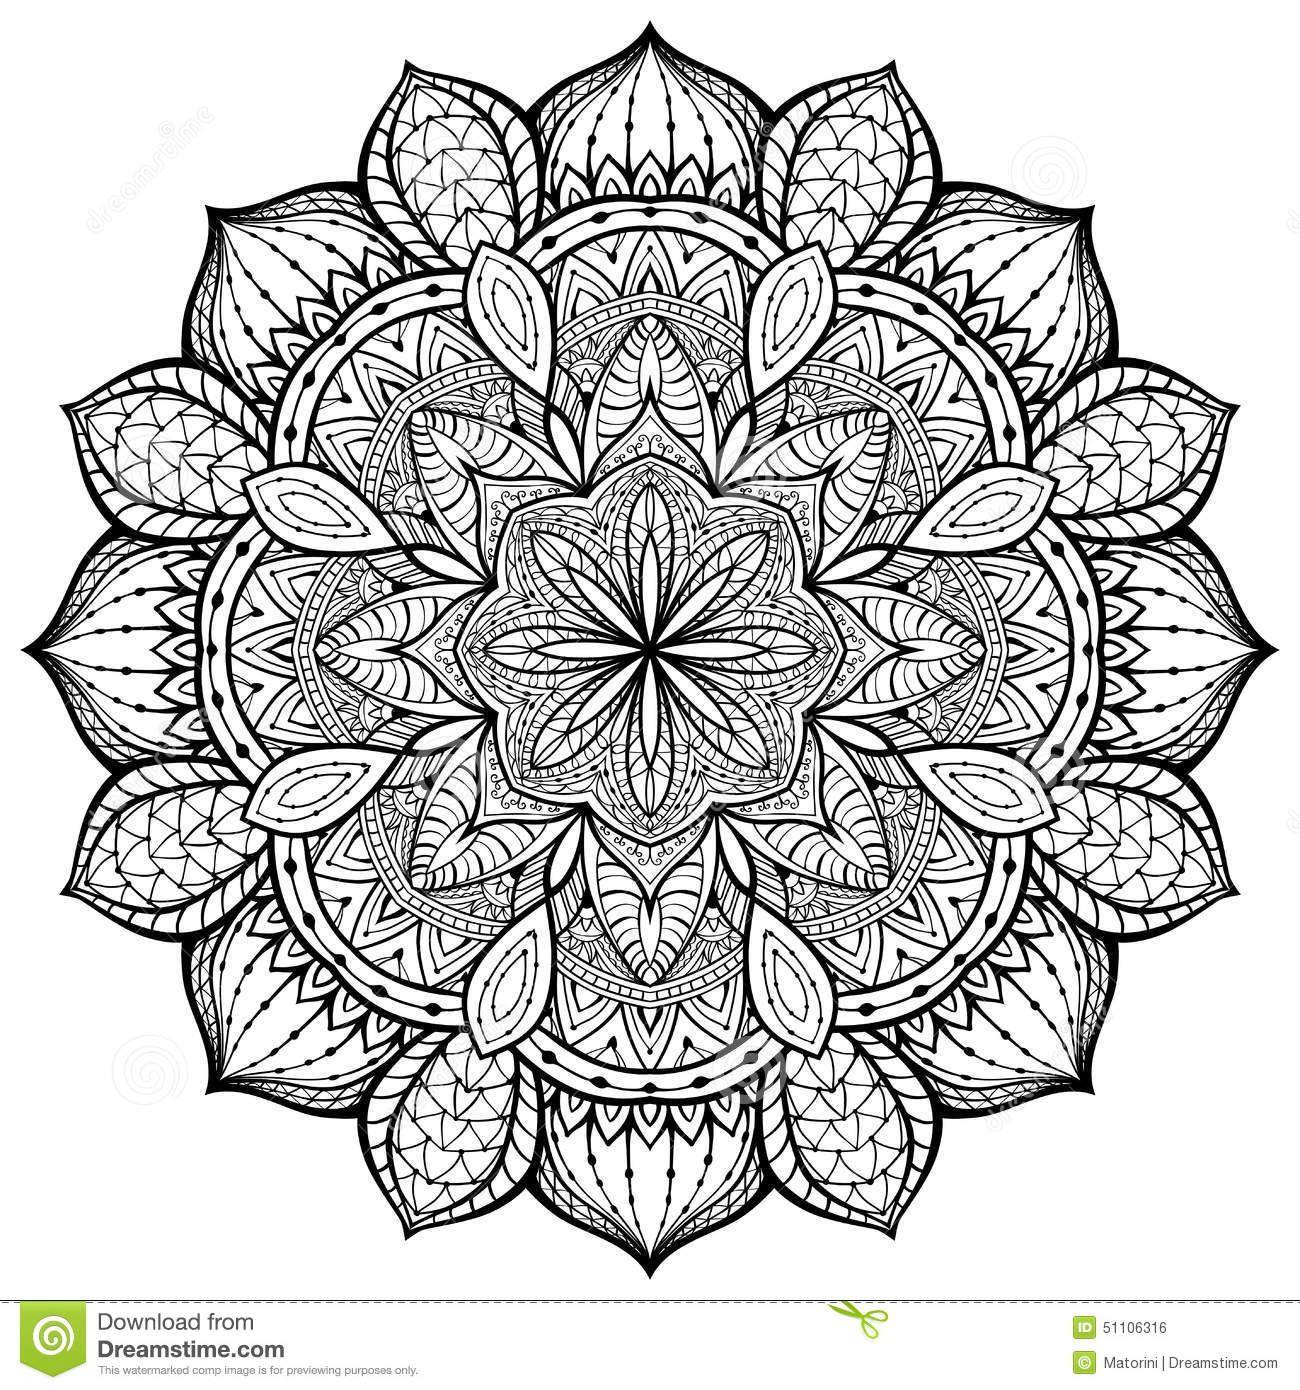 google images mandala coloring pages - photo#43